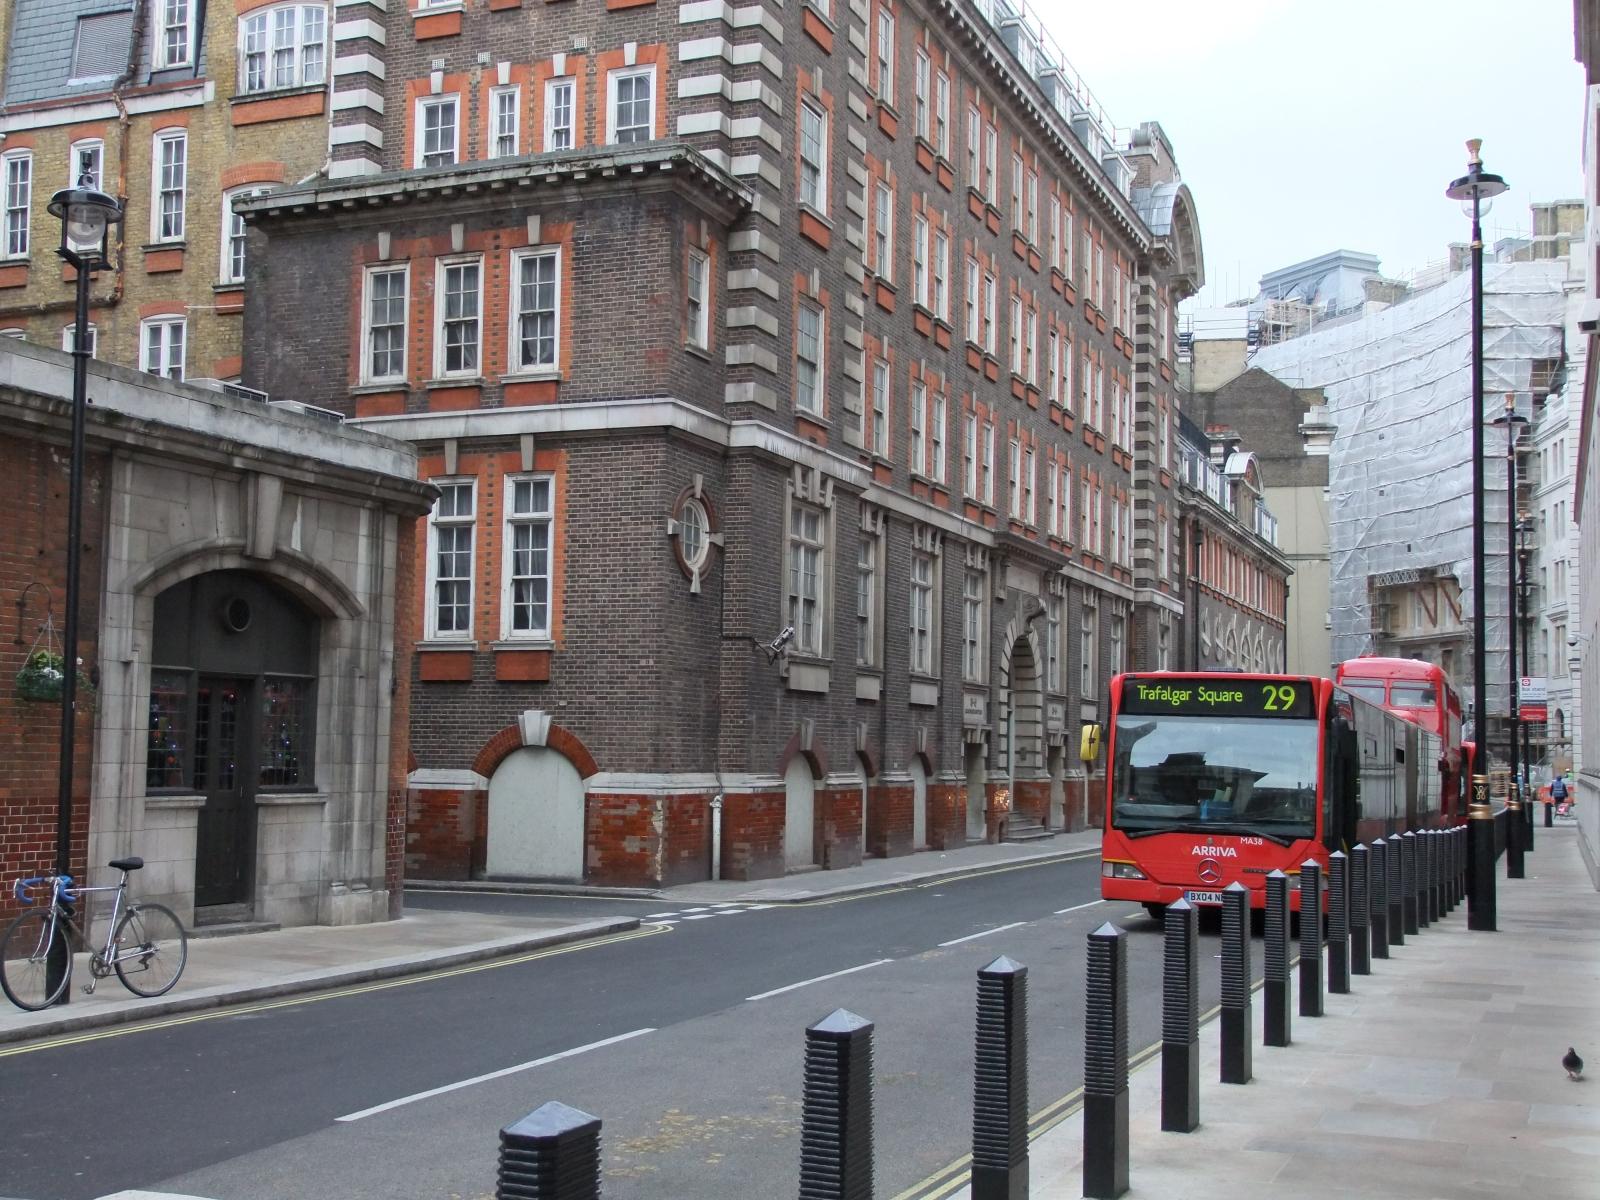 Great Scotland Yard building